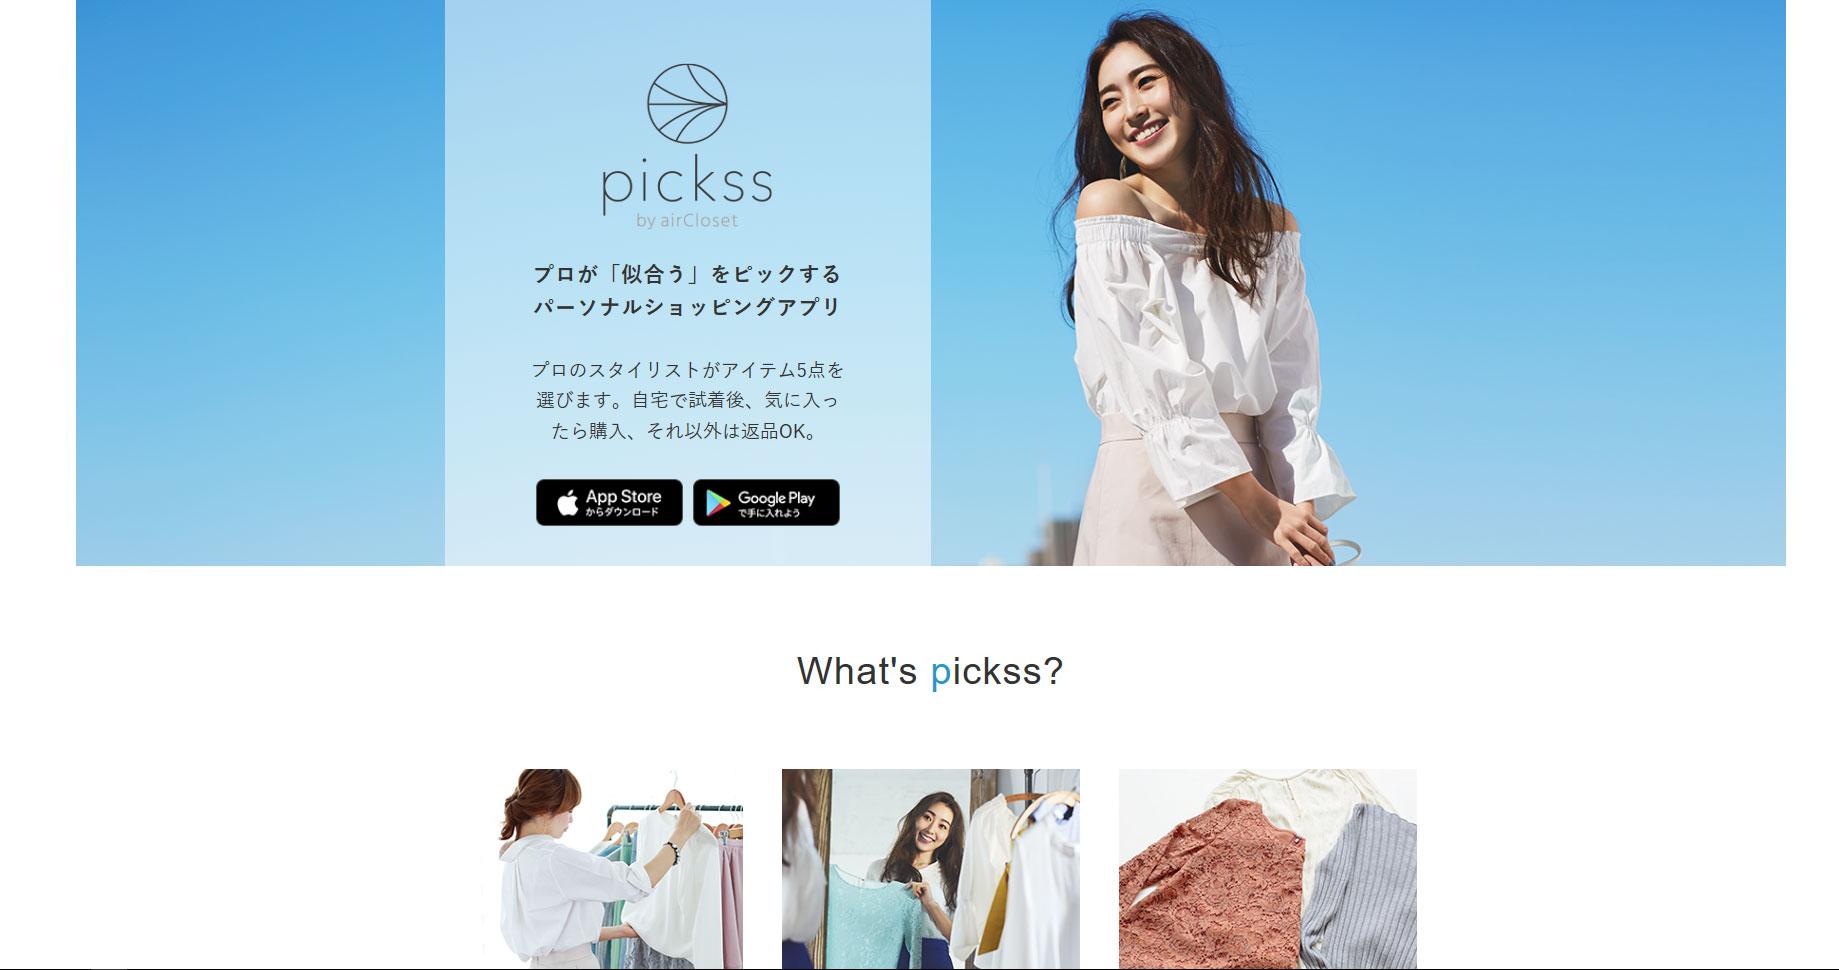 pickss